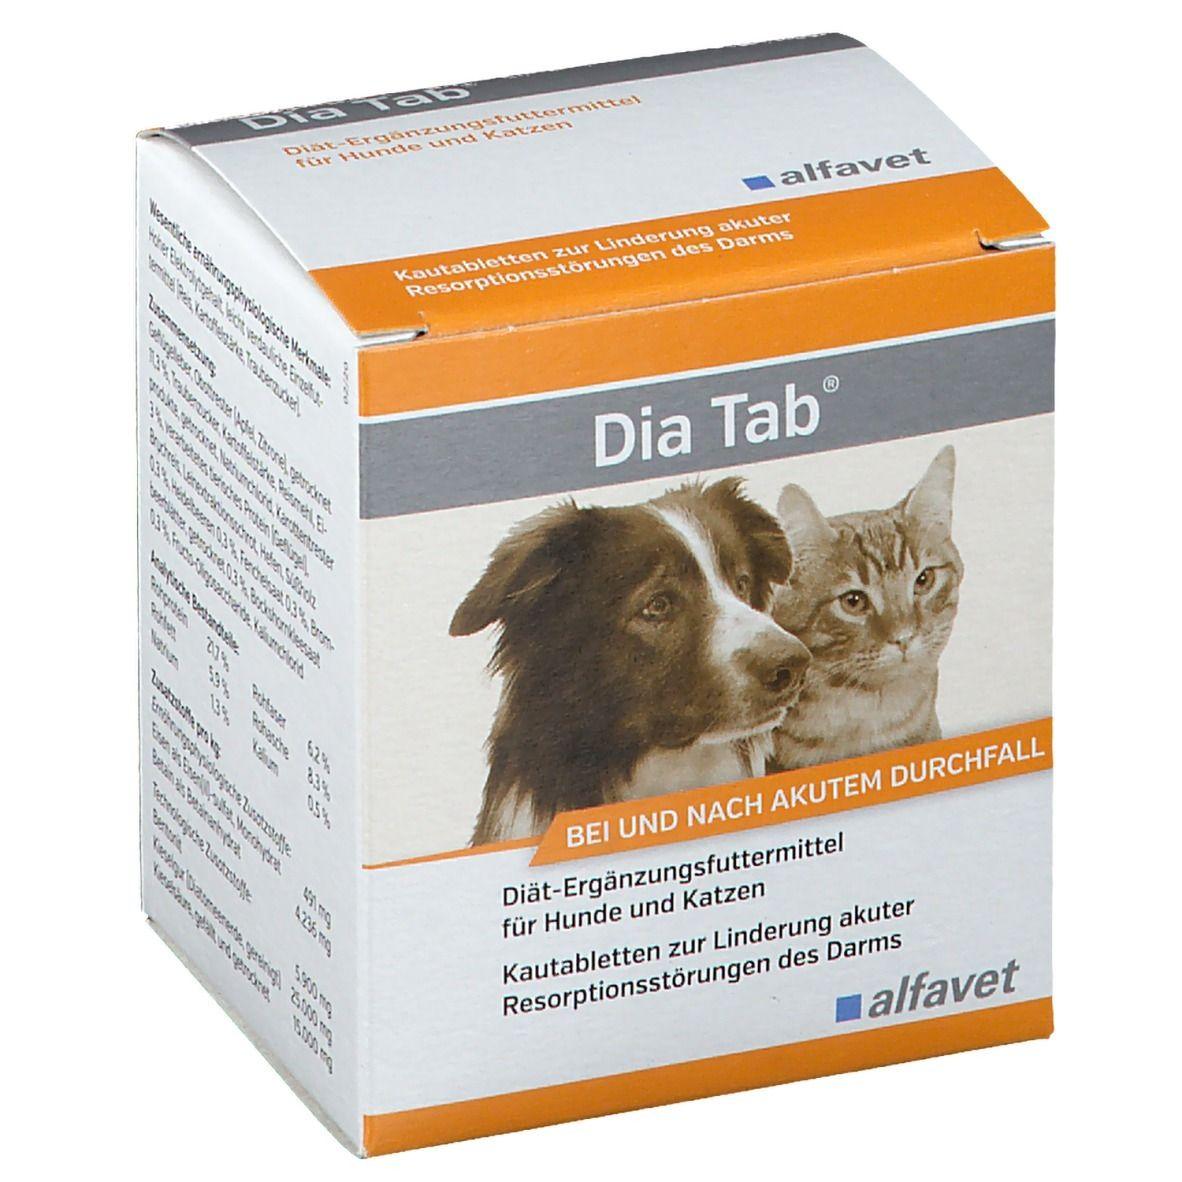 Image of Dia Tab®